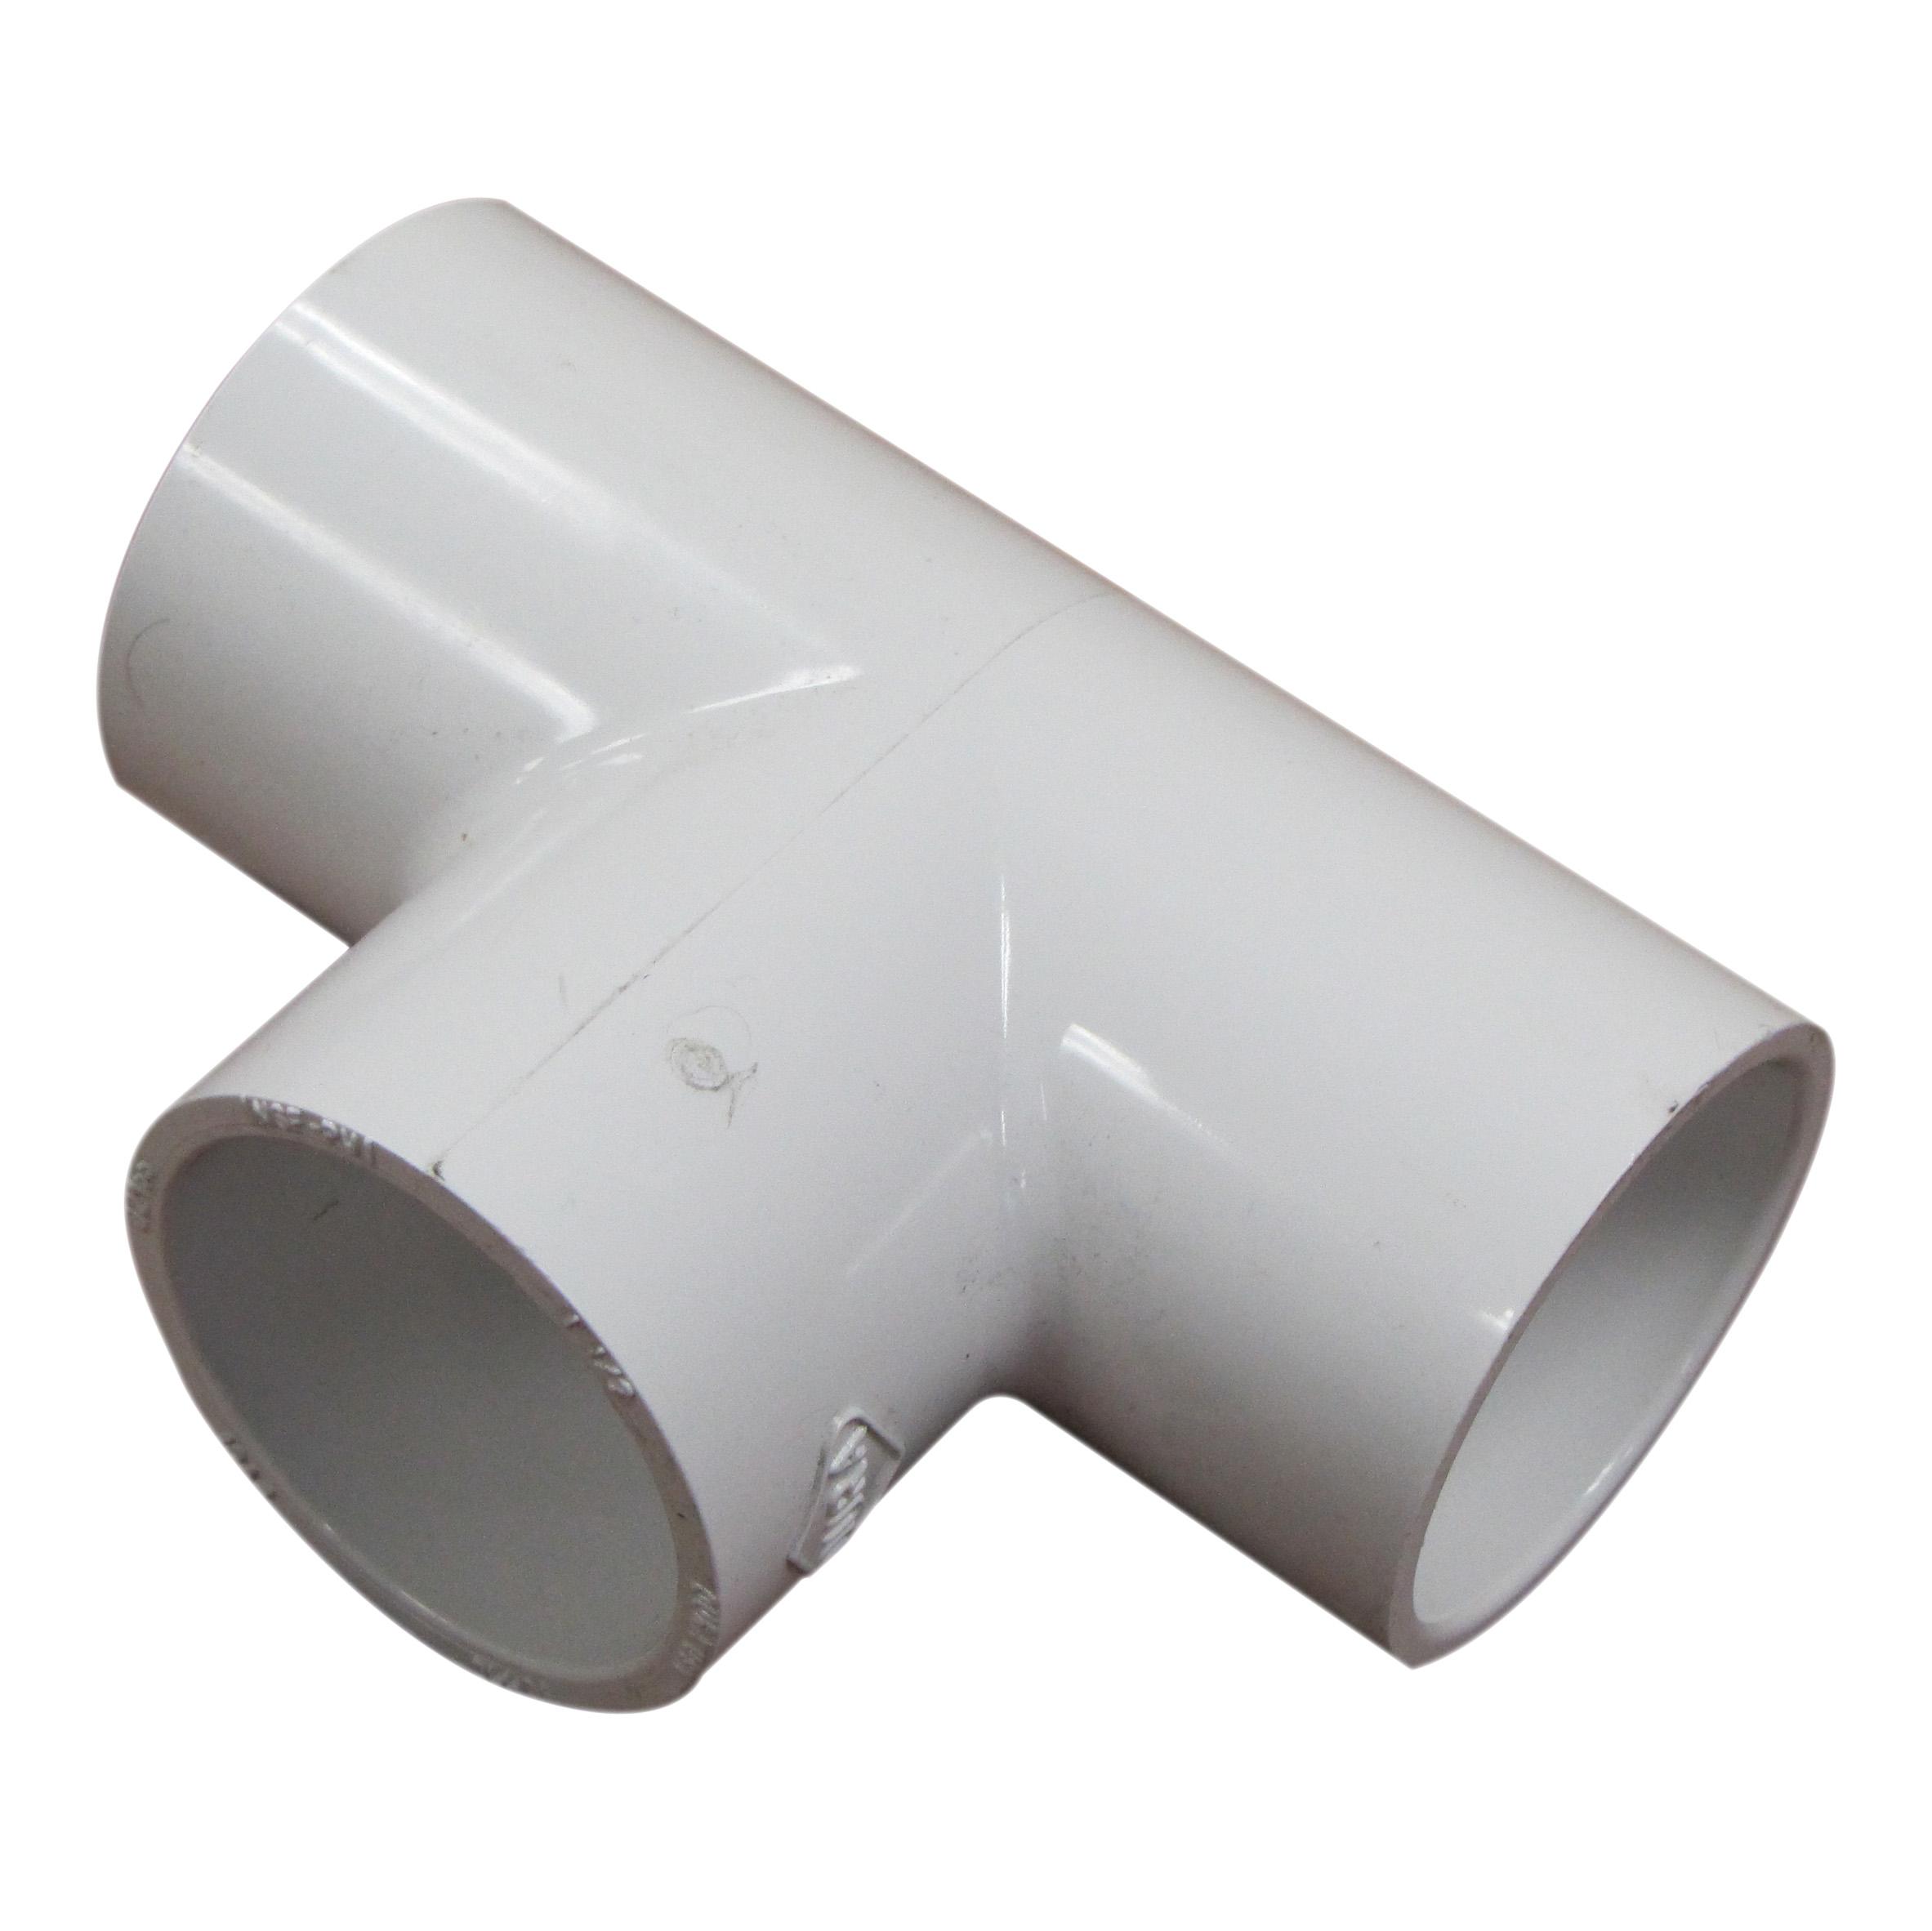 1 5 Inch Tee Slip Slip Slip Pool Supplies Canada